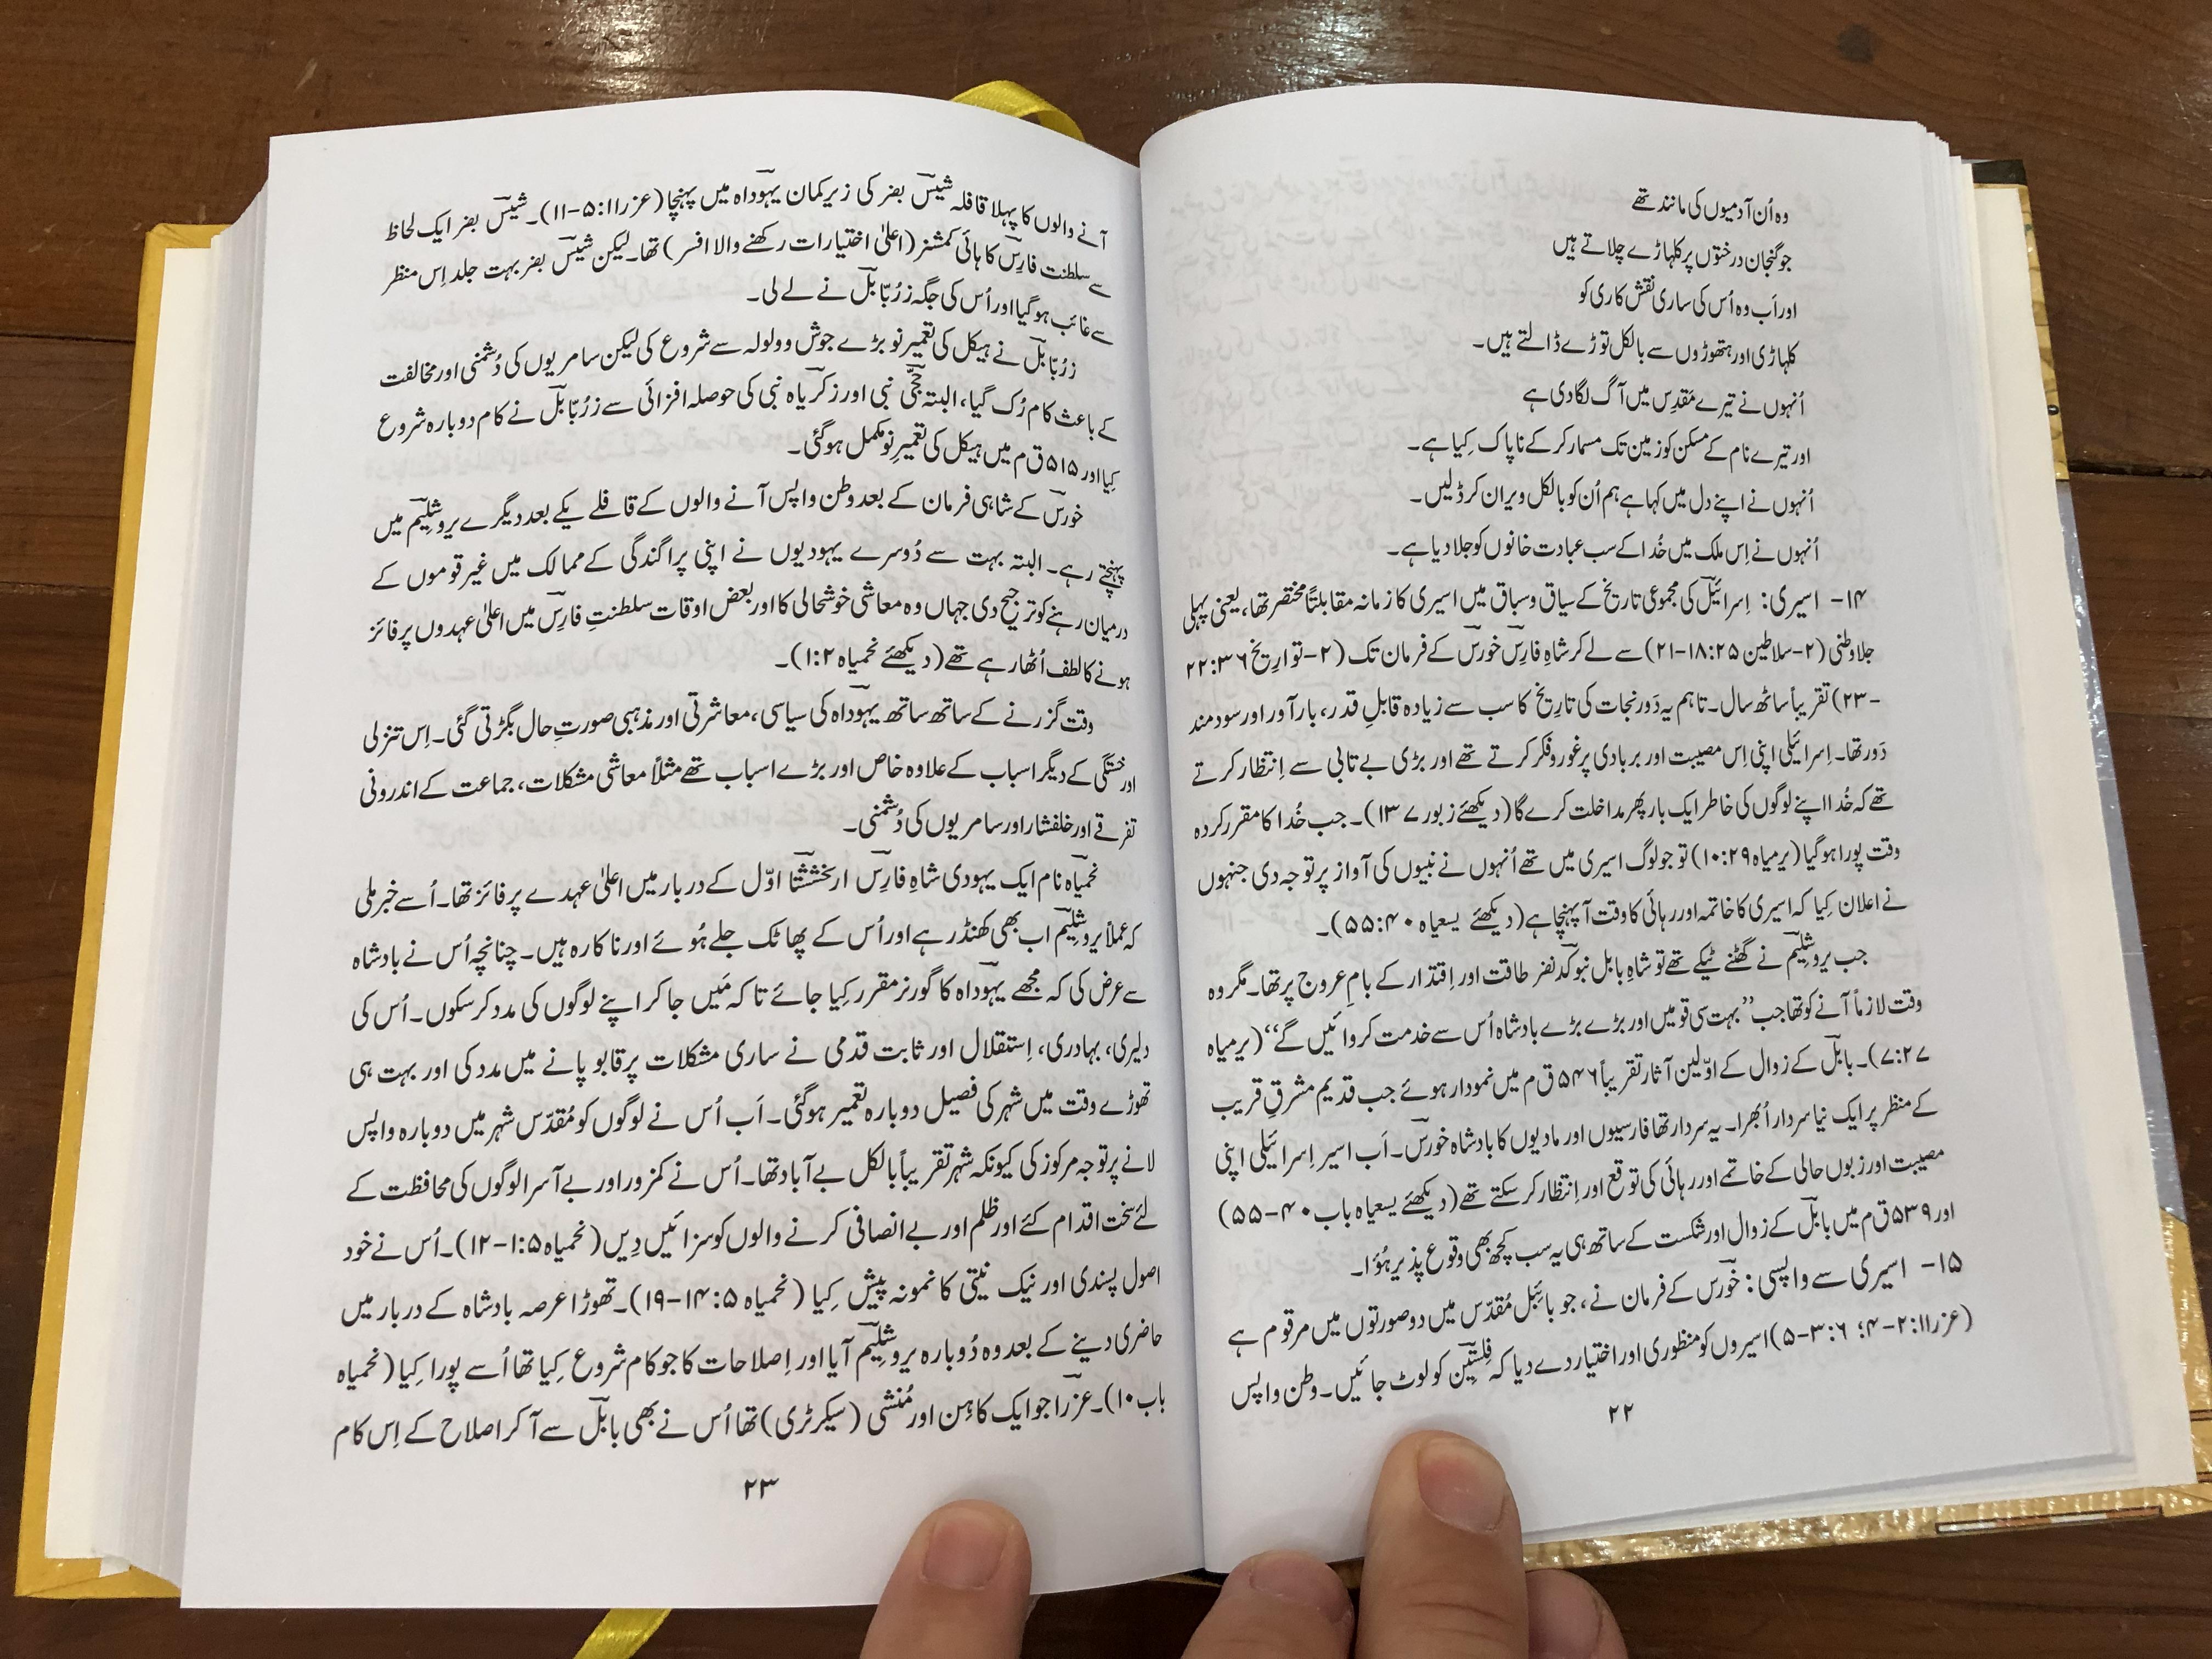 discover-the-bible-in-urdu-language-motdaba-kalam-e-muqadds-hardcover-2013-pakistan-bible-society-9-.jpg